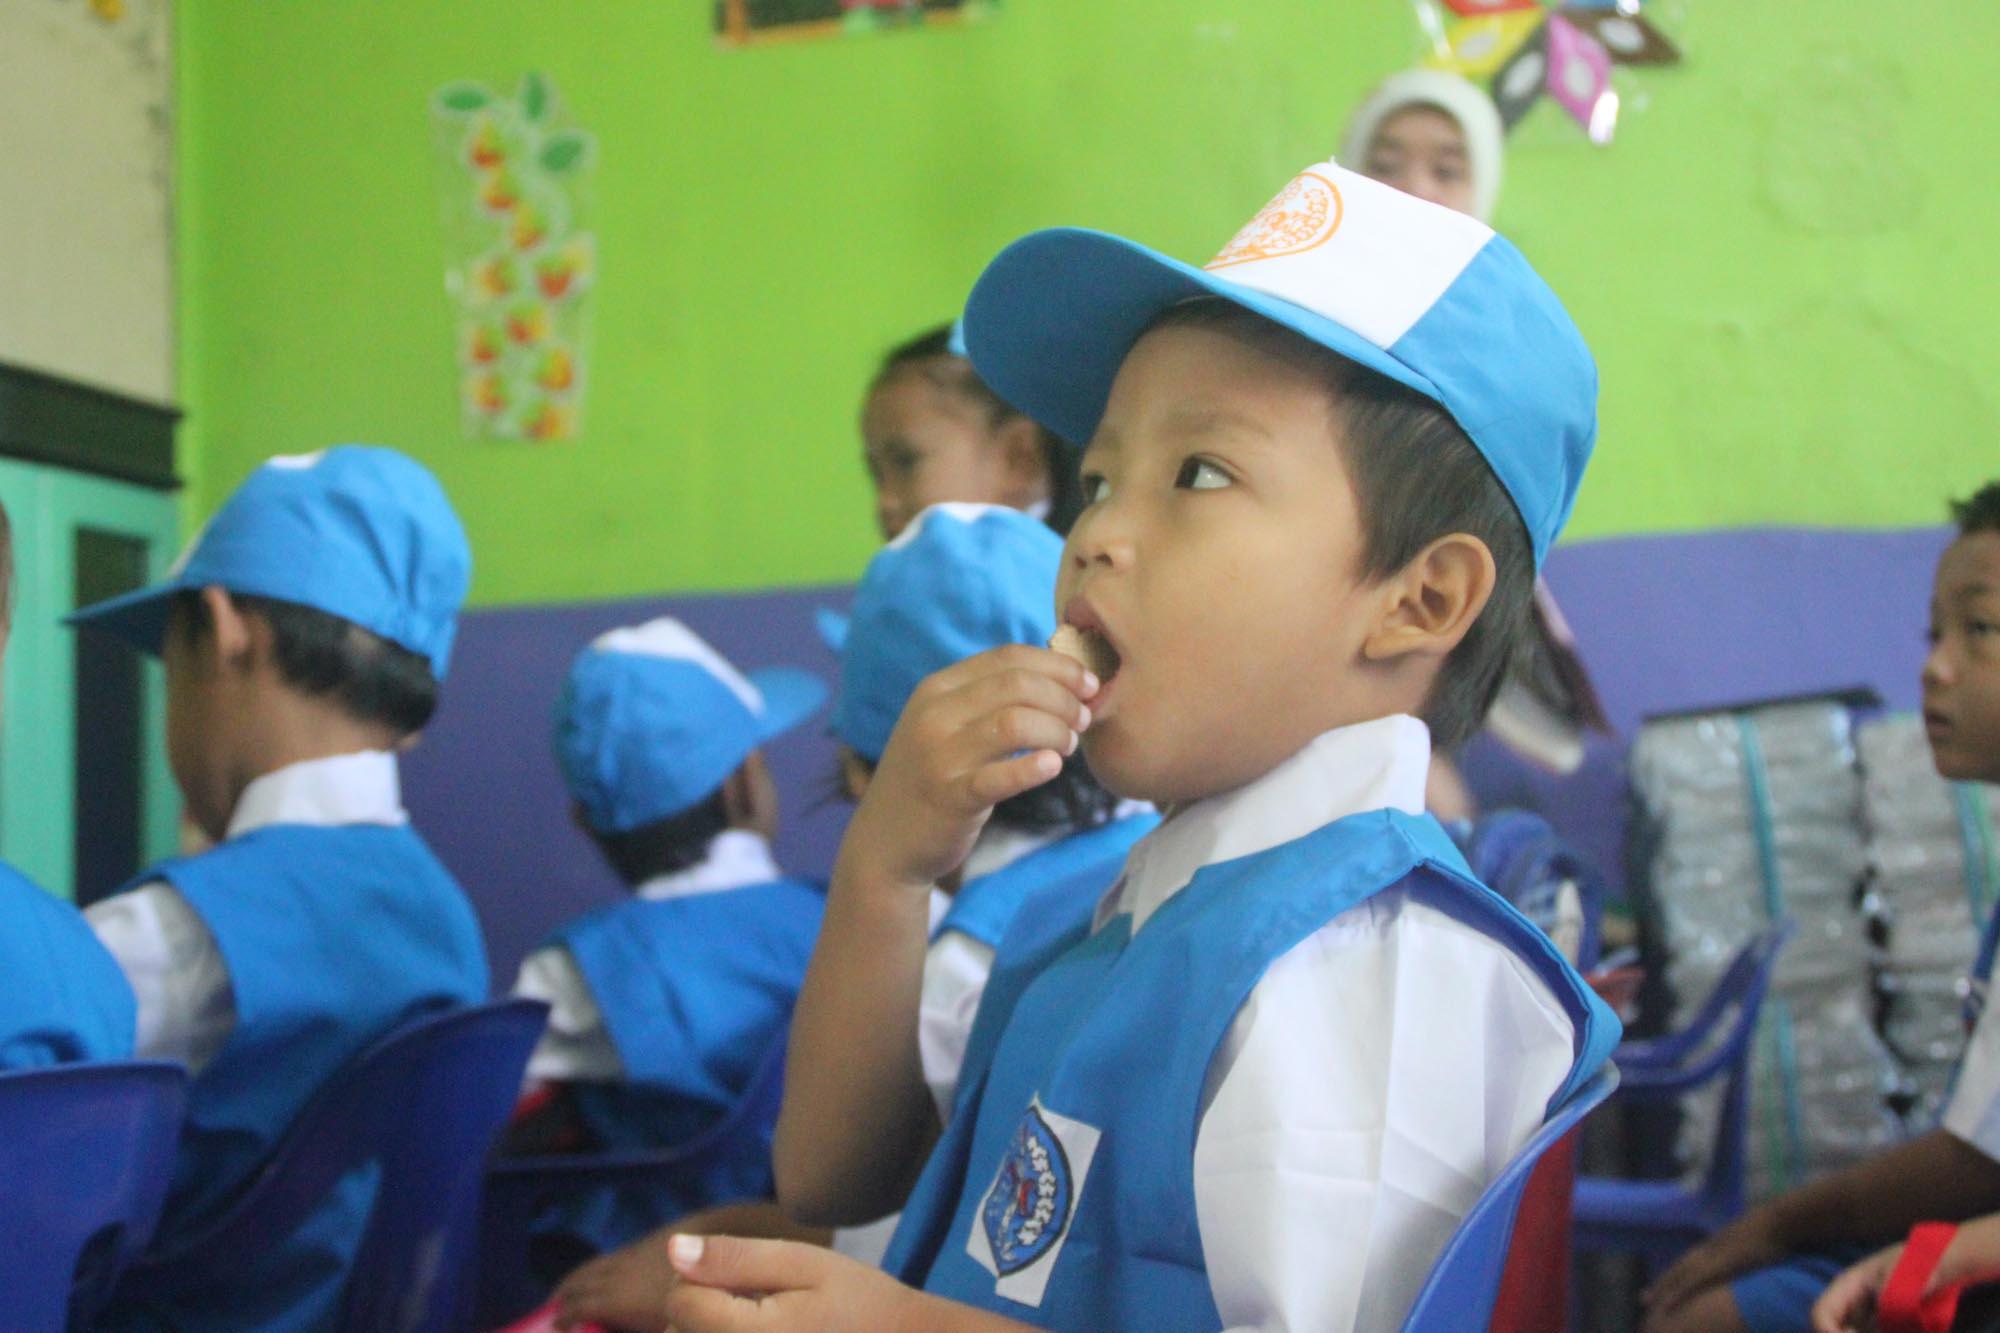 Download 500 Gambar Lucu Anak Masuk Sekolah Paling Lucu